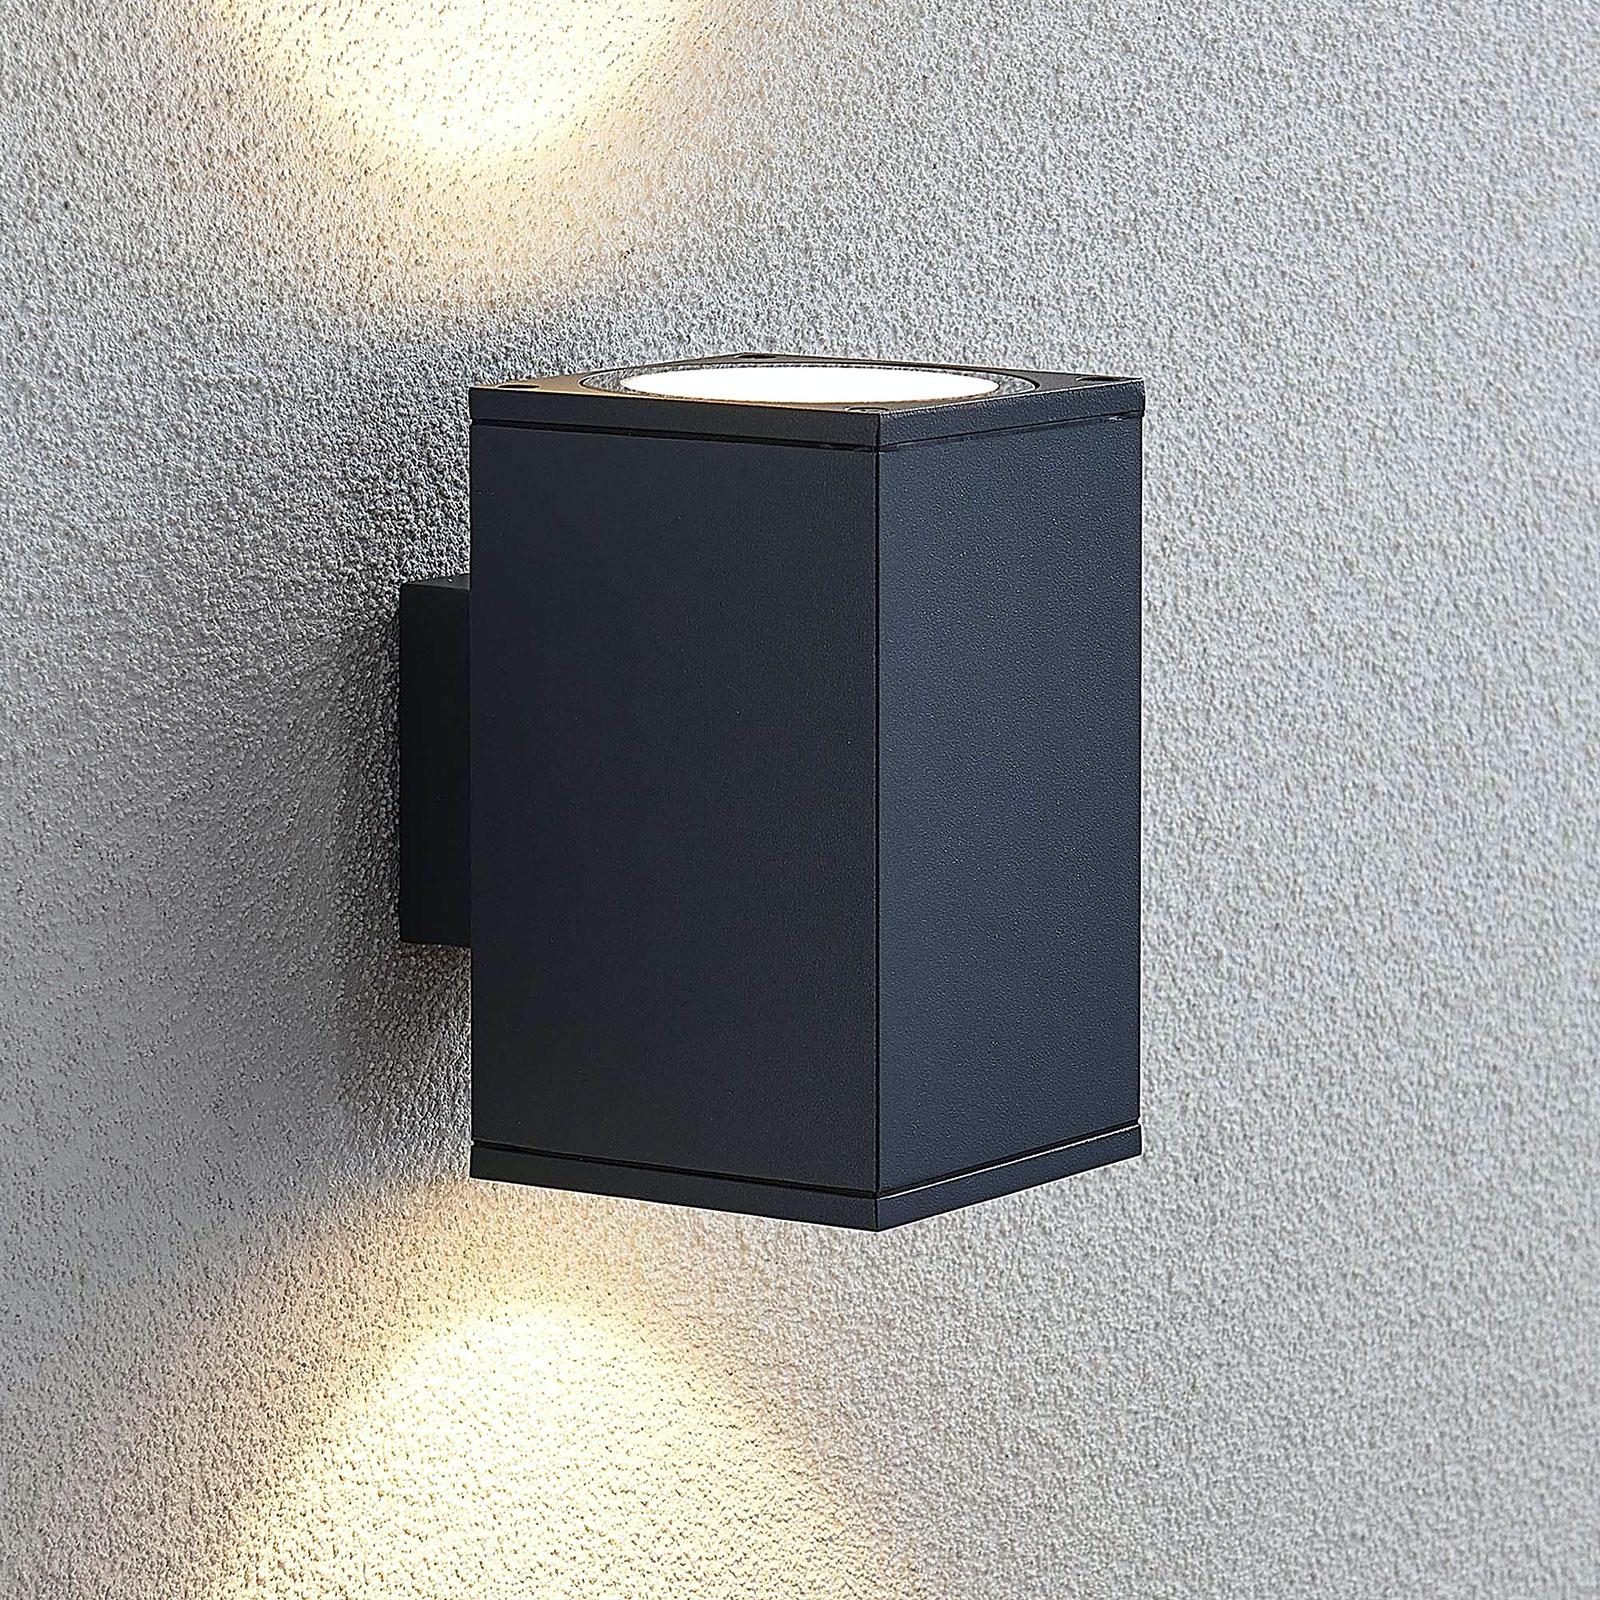 LED-Außenwandlampe Mekita, zweiflammig